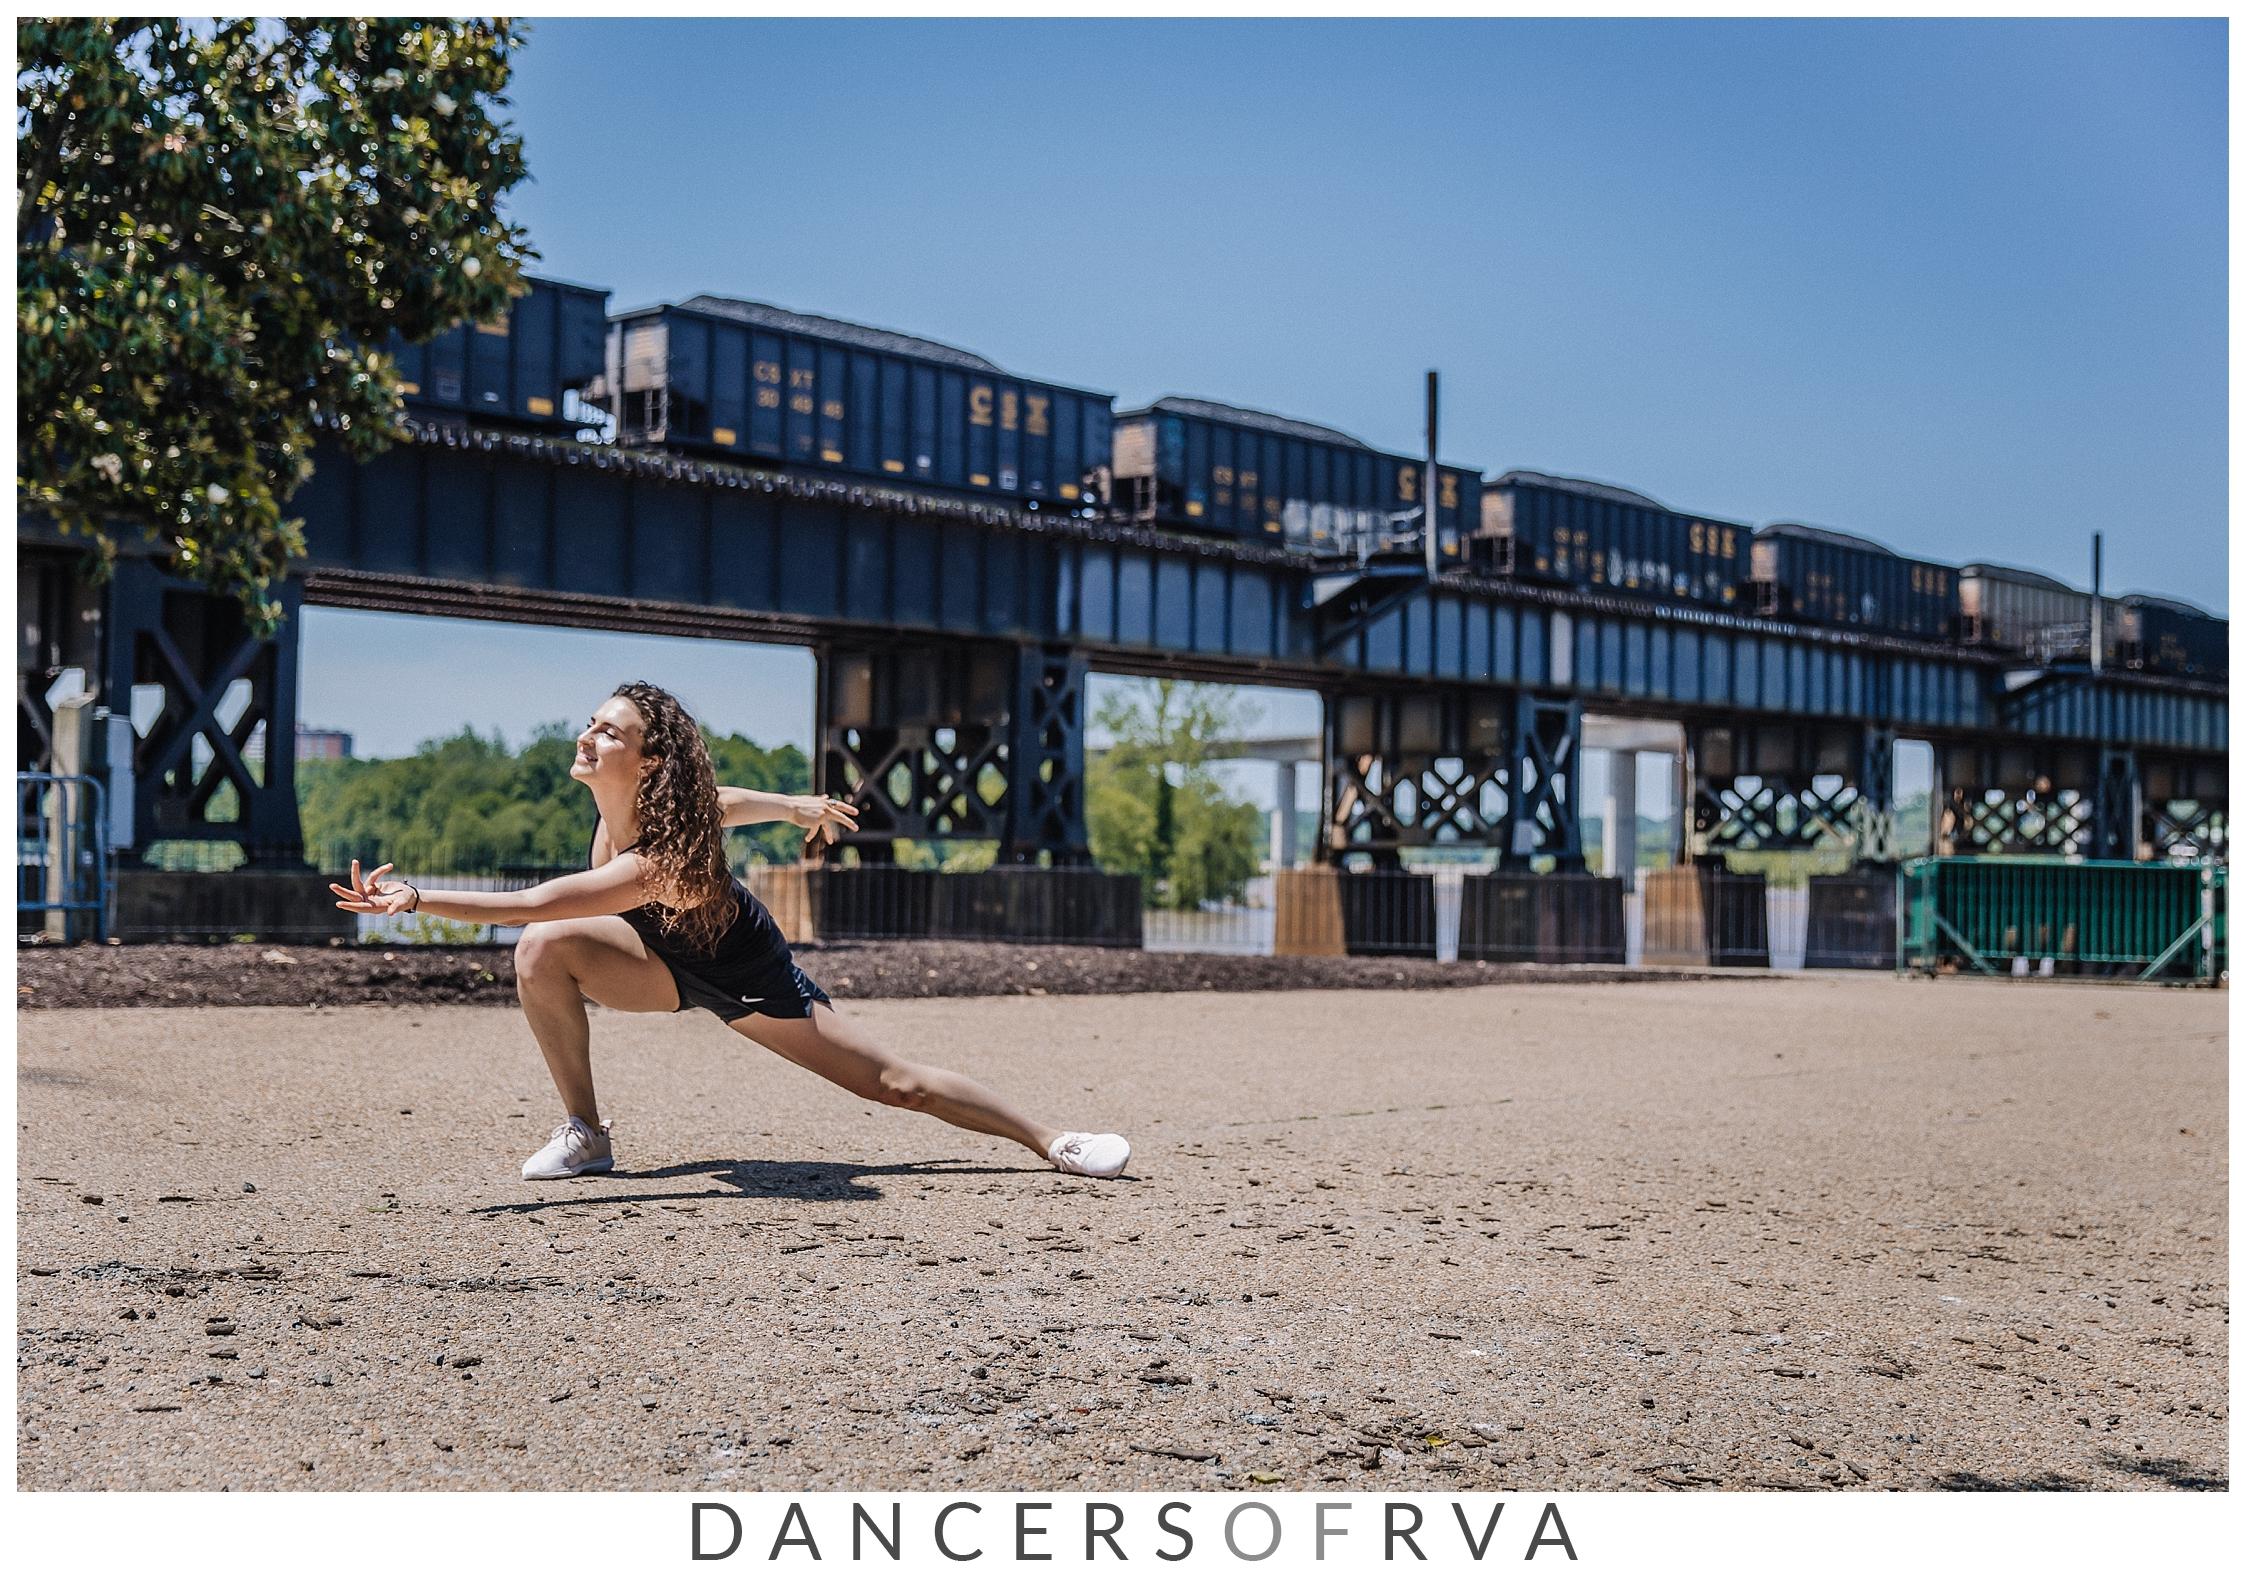 Virginia-Repertory-Theatre-Dancers-of-RVA-Belle-Isle-Dance-Session_0010.jpg